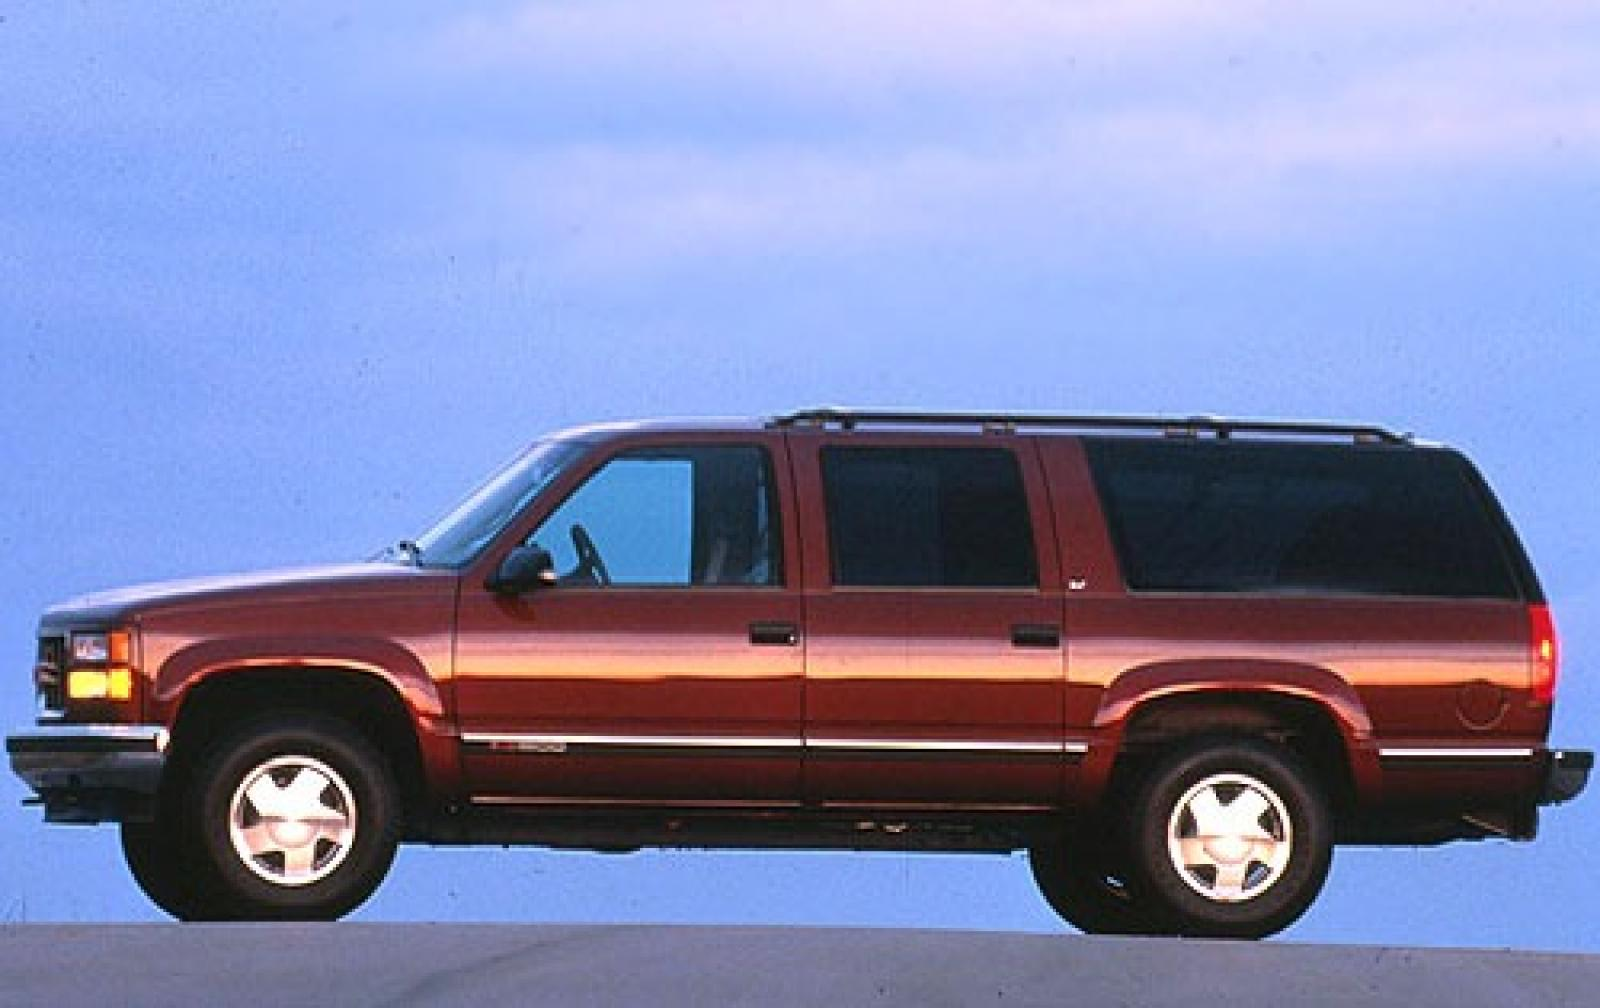 1998 gmc suburban 1 800 1024 1280 1600 origin